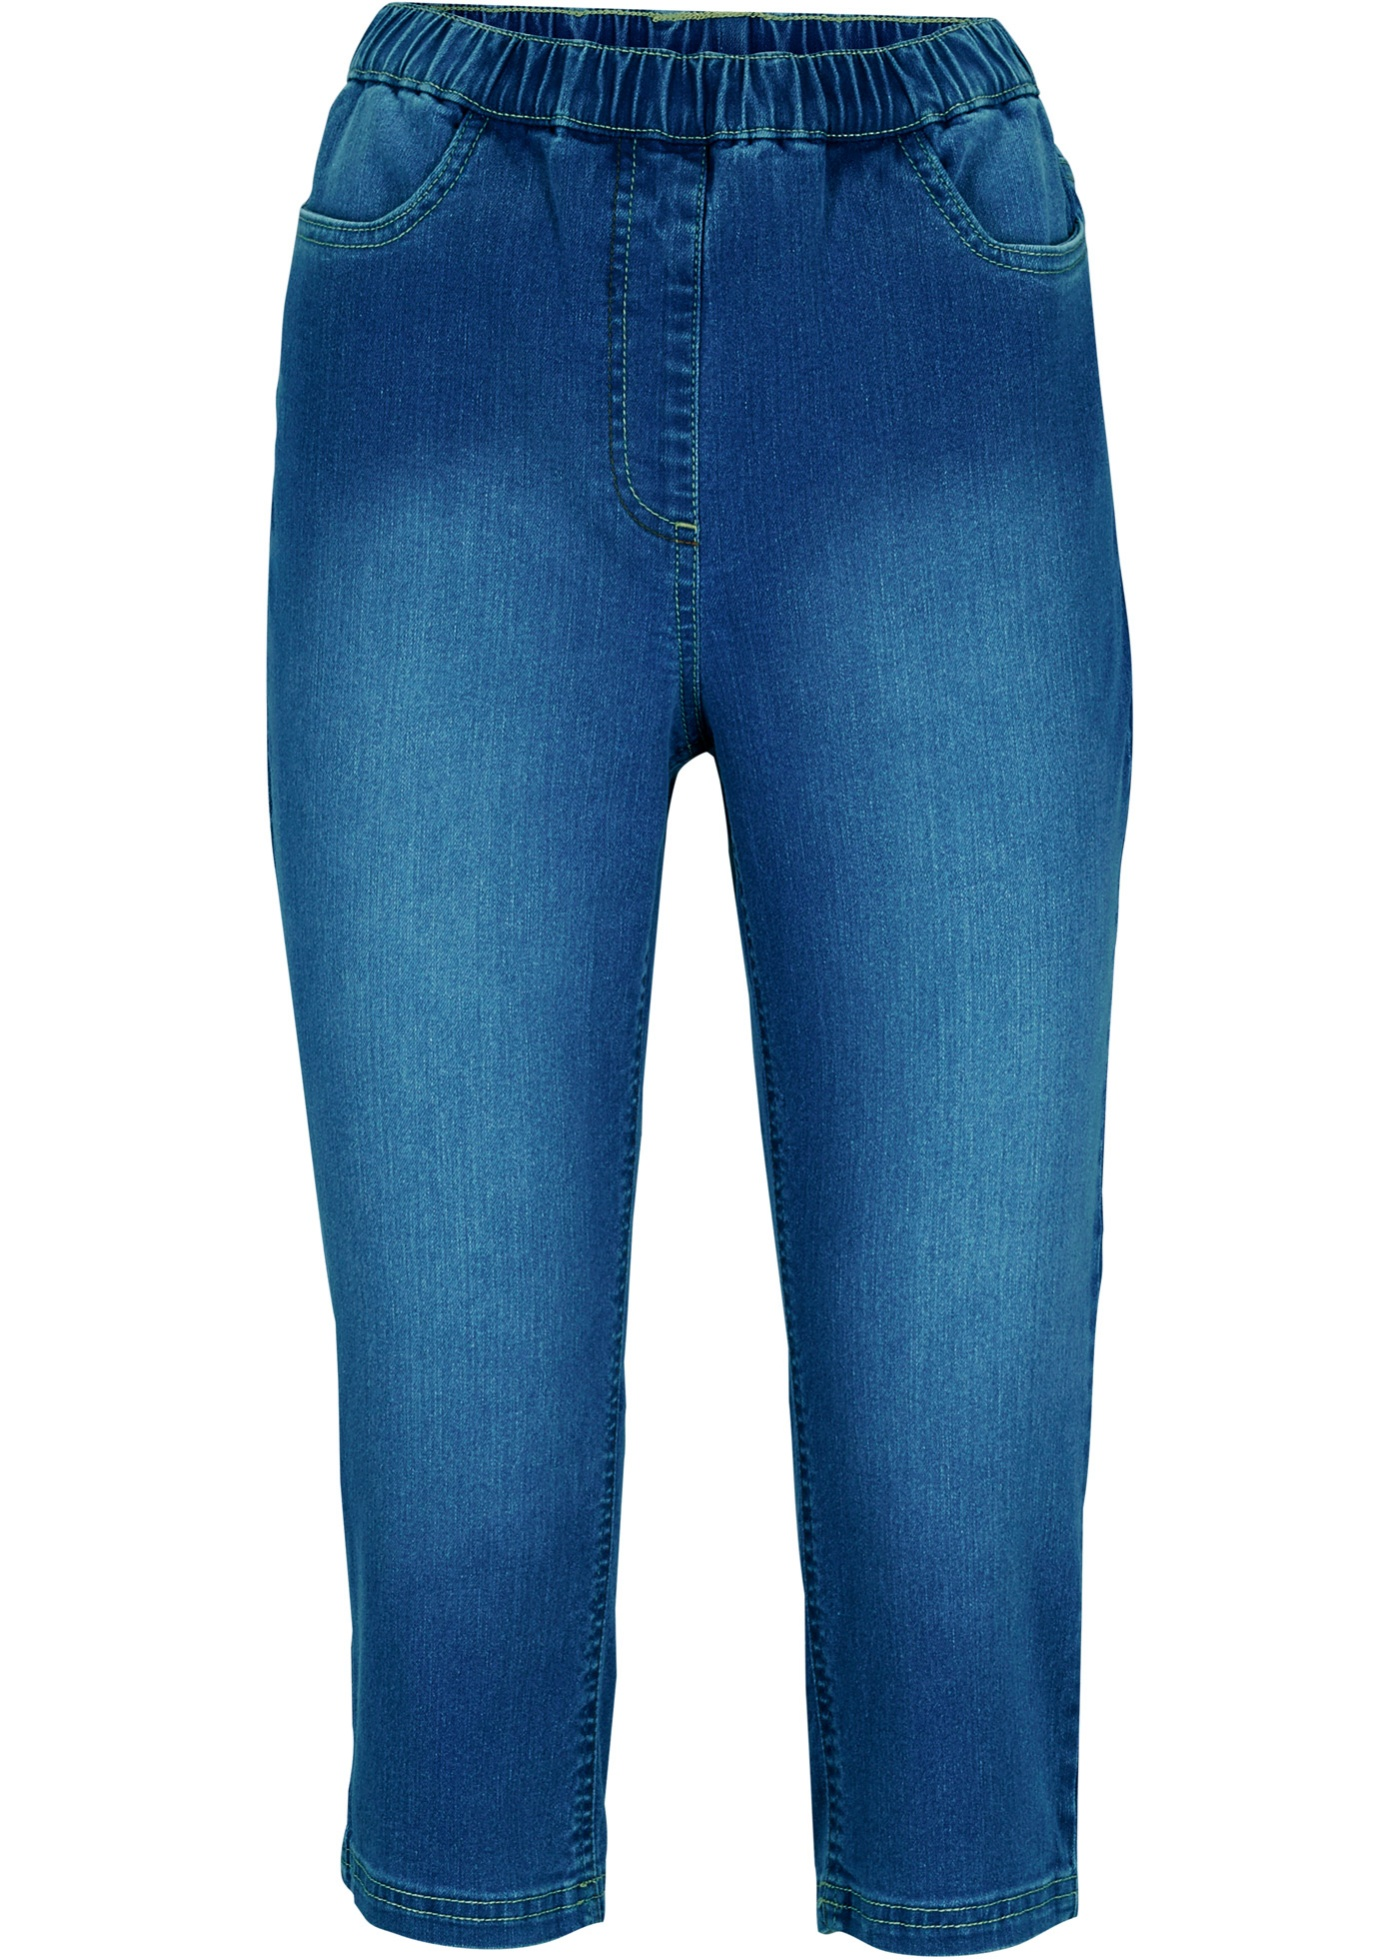 Jean corsaire confort stretch avec taille confortable, Skinny